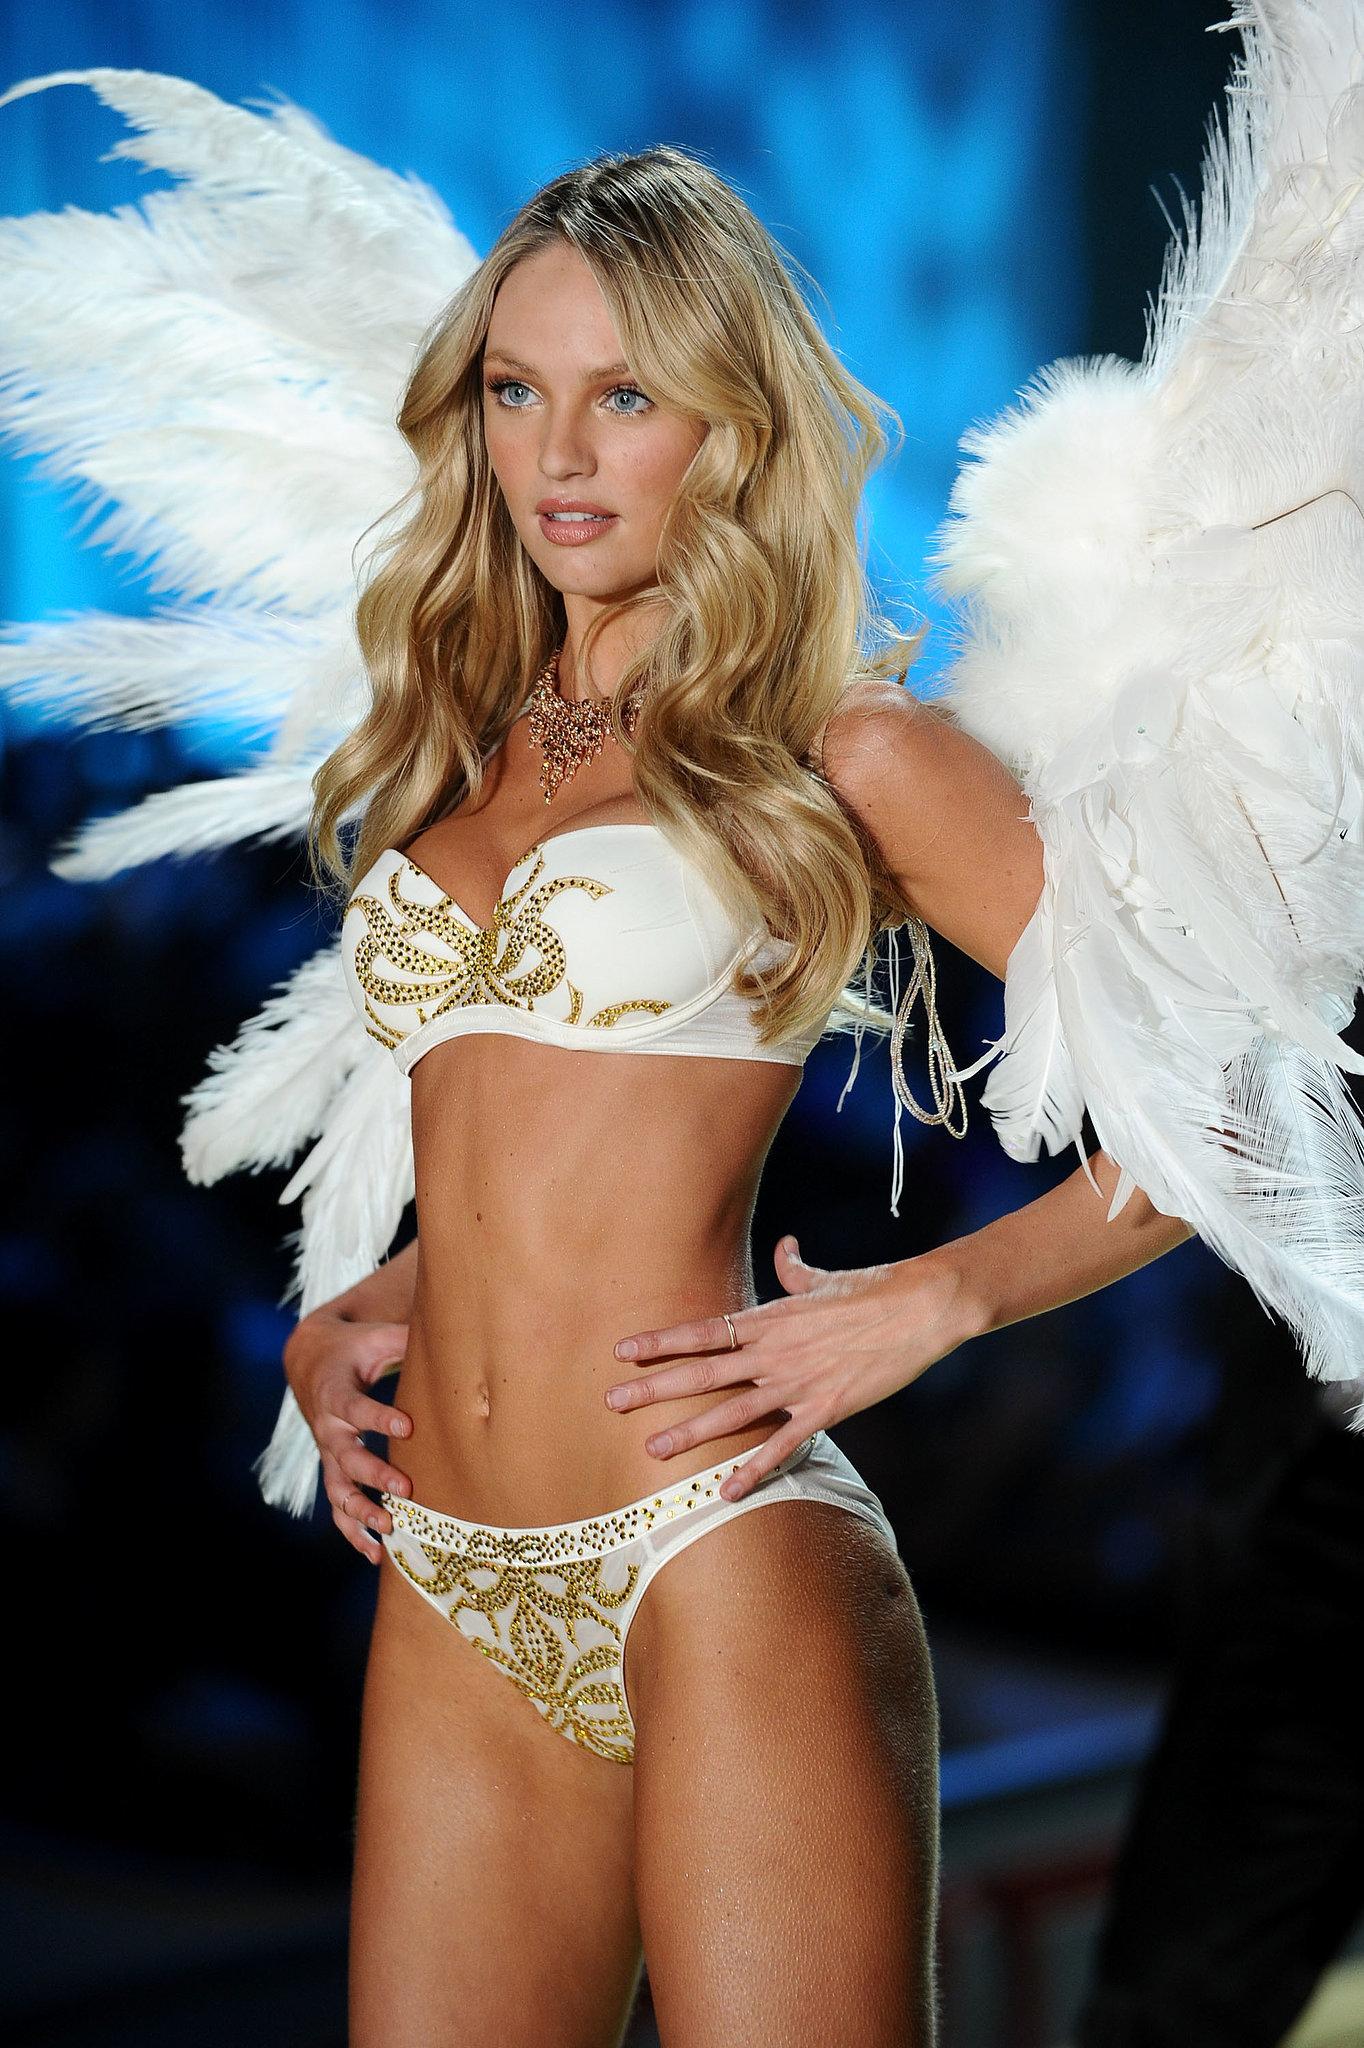 She Makes Dressing Like an Angel Look Hot